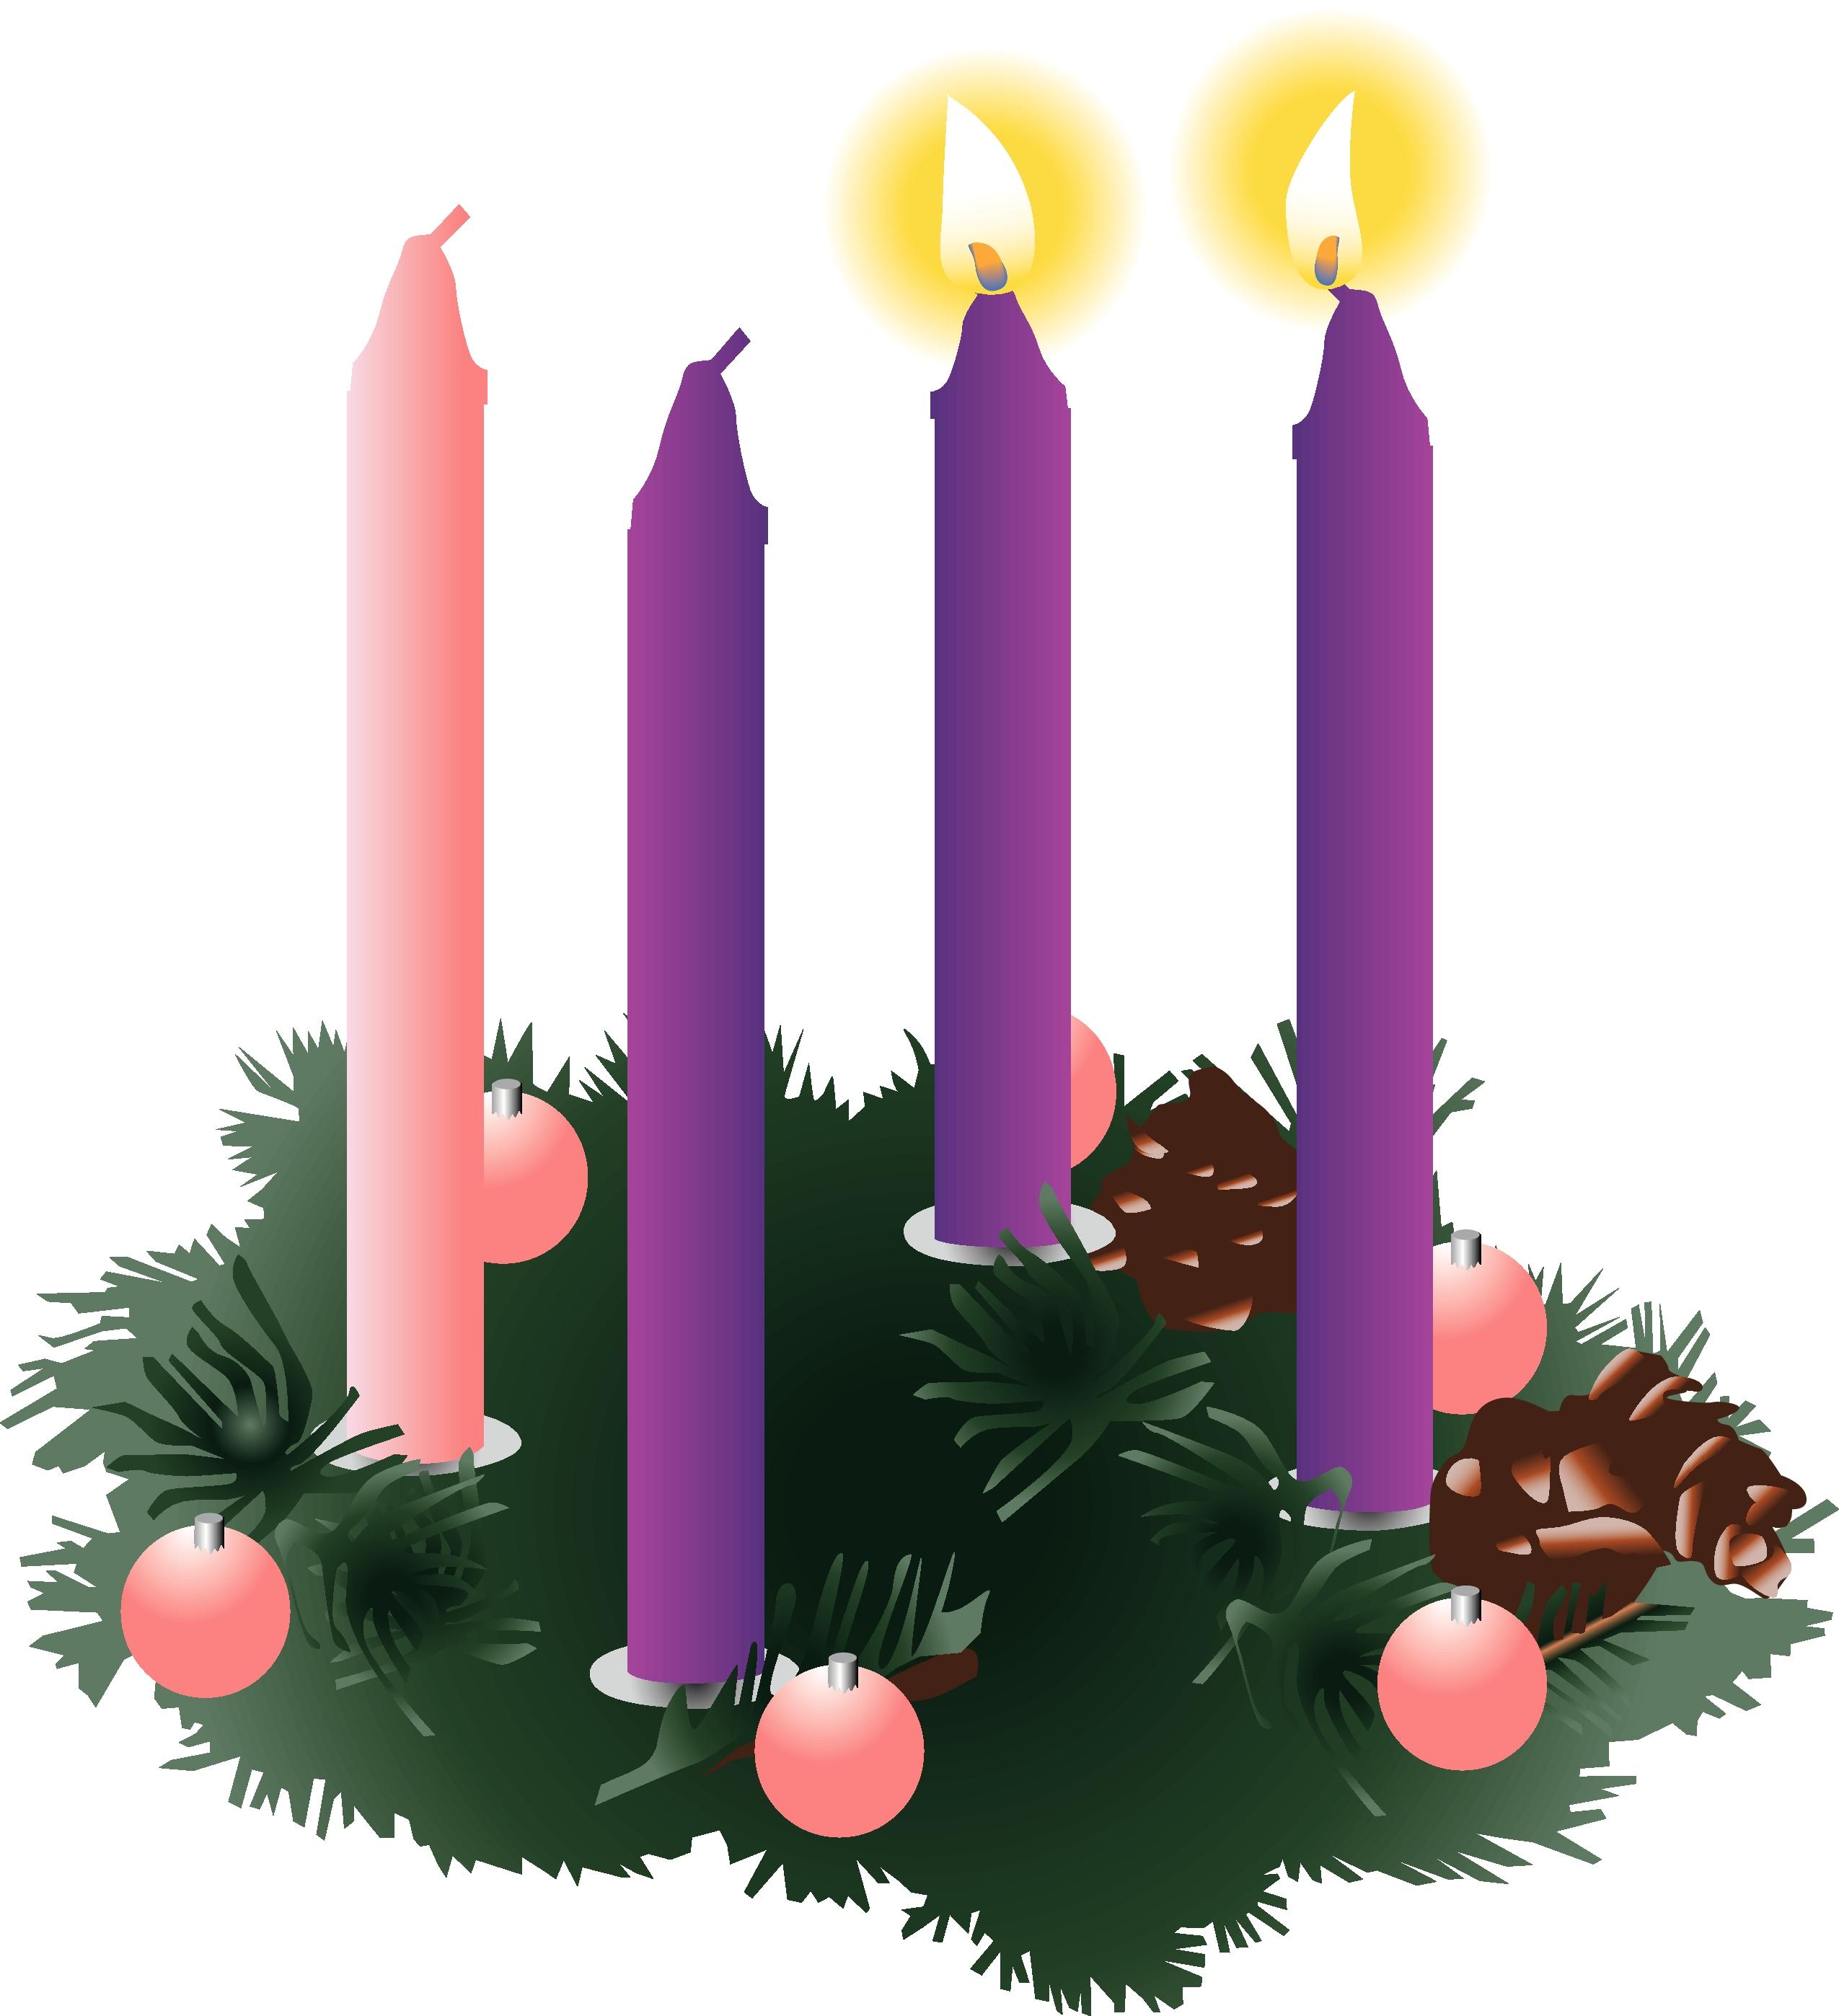 Third Sunday Of Advent Clip Art N3 free image.